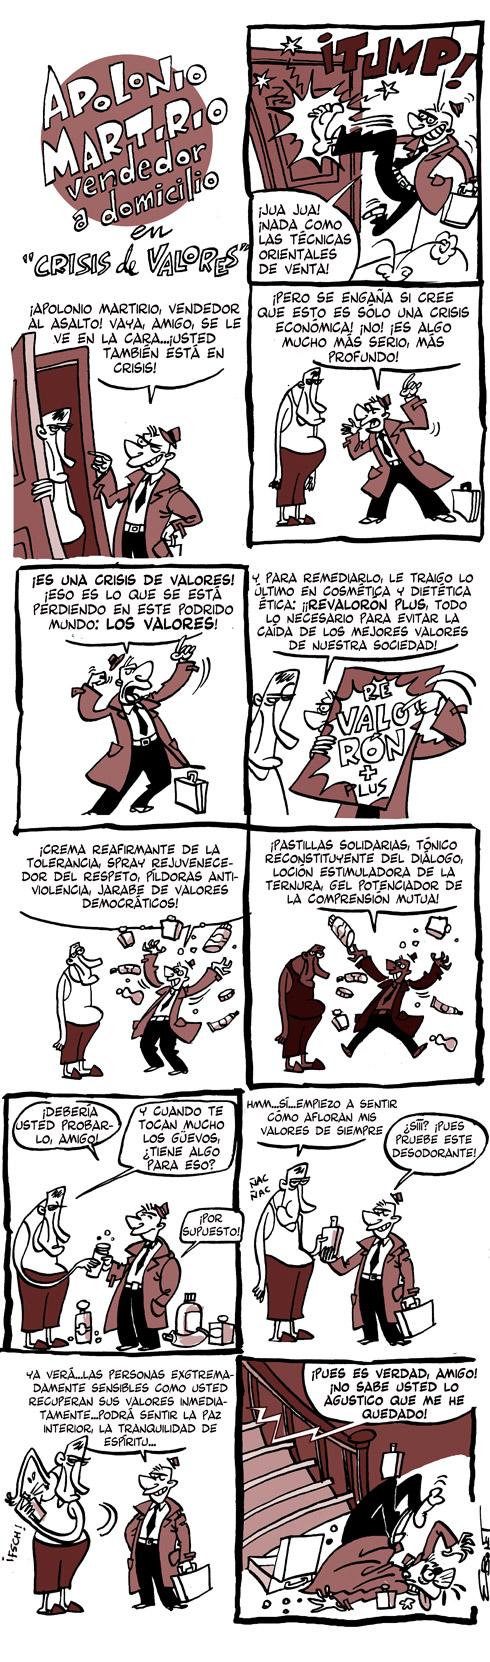 crisis-de-valores